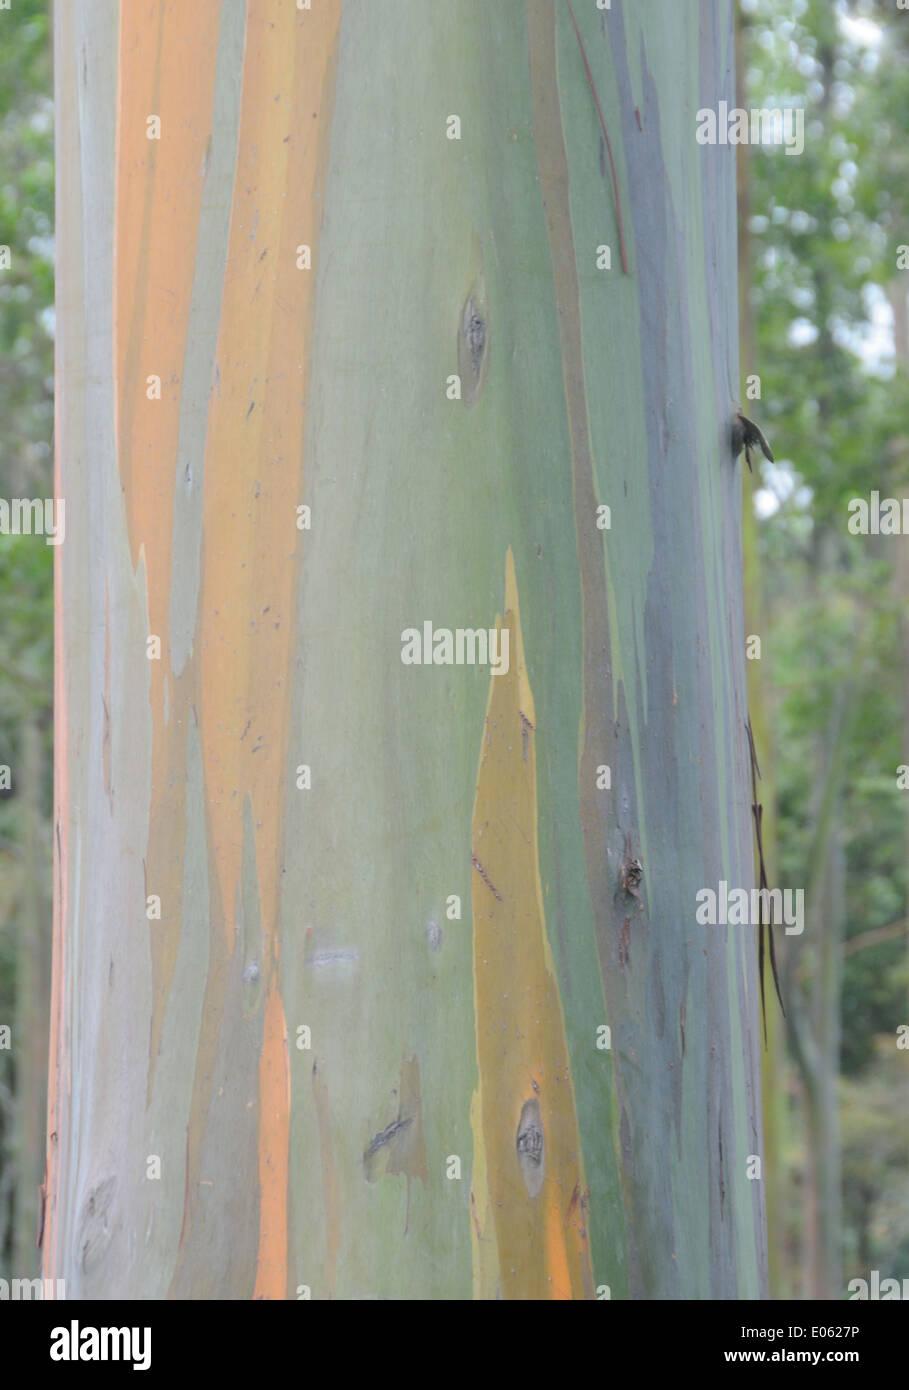 Varicoloured bark of a tree in a city park. San Jose, Costa Rica. - Stock Image